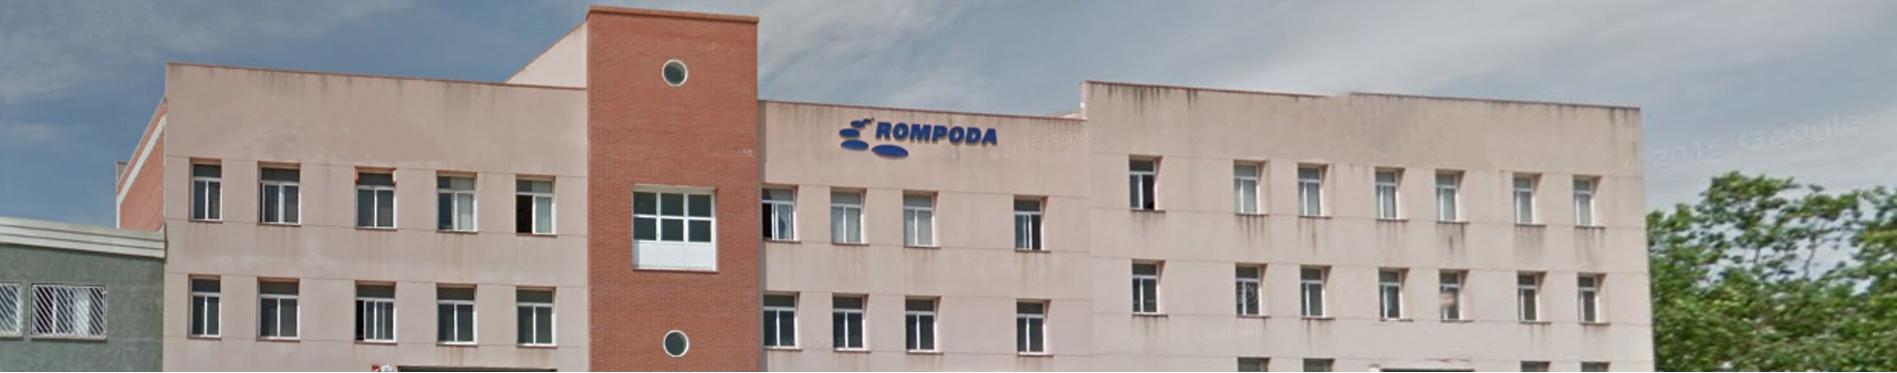 Rompoda Empresa